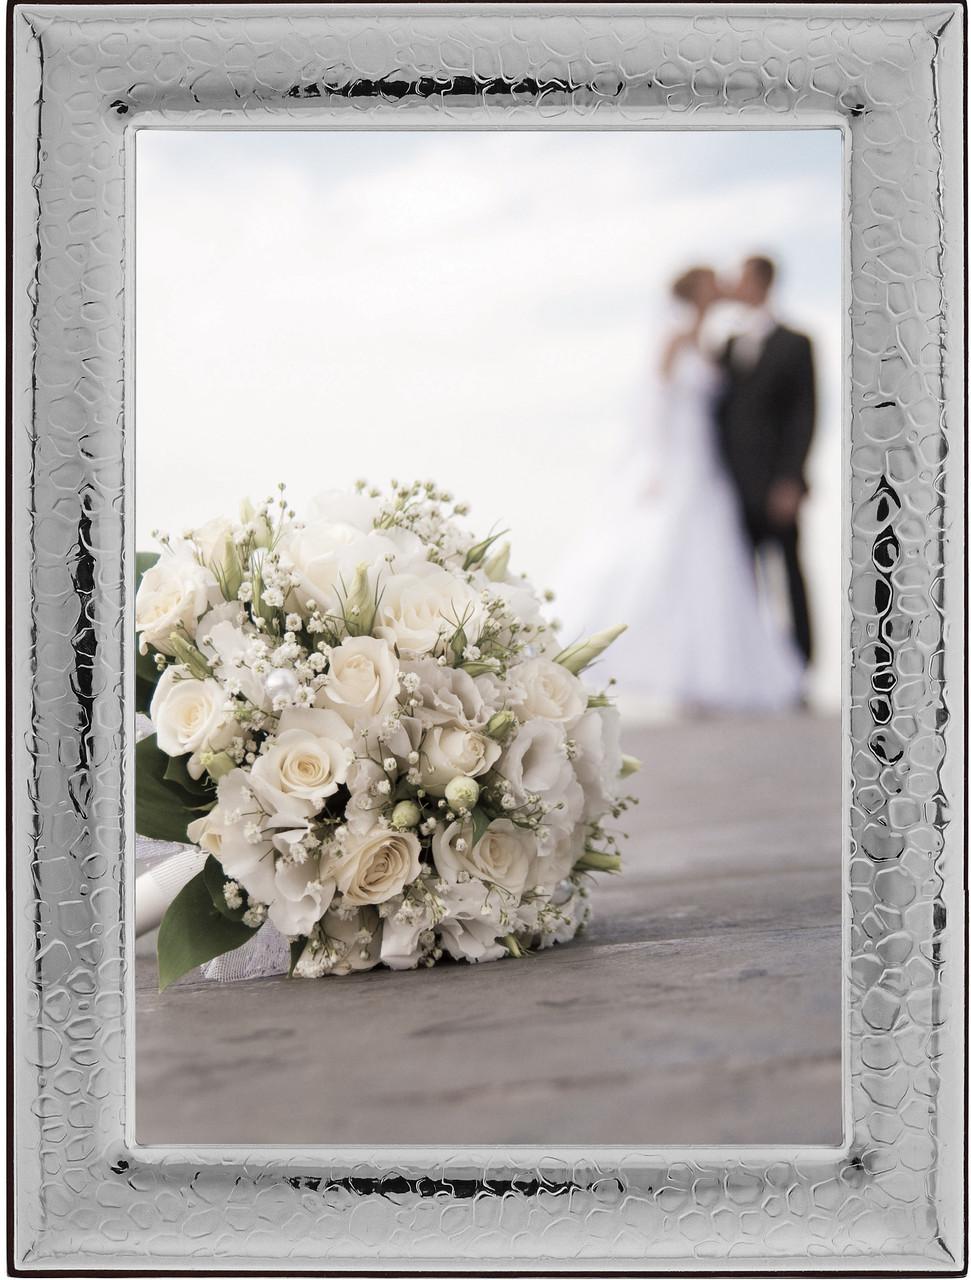 Фоторамка на годовщину свадьбы 18х24 ексклюзив Prince Silvreo